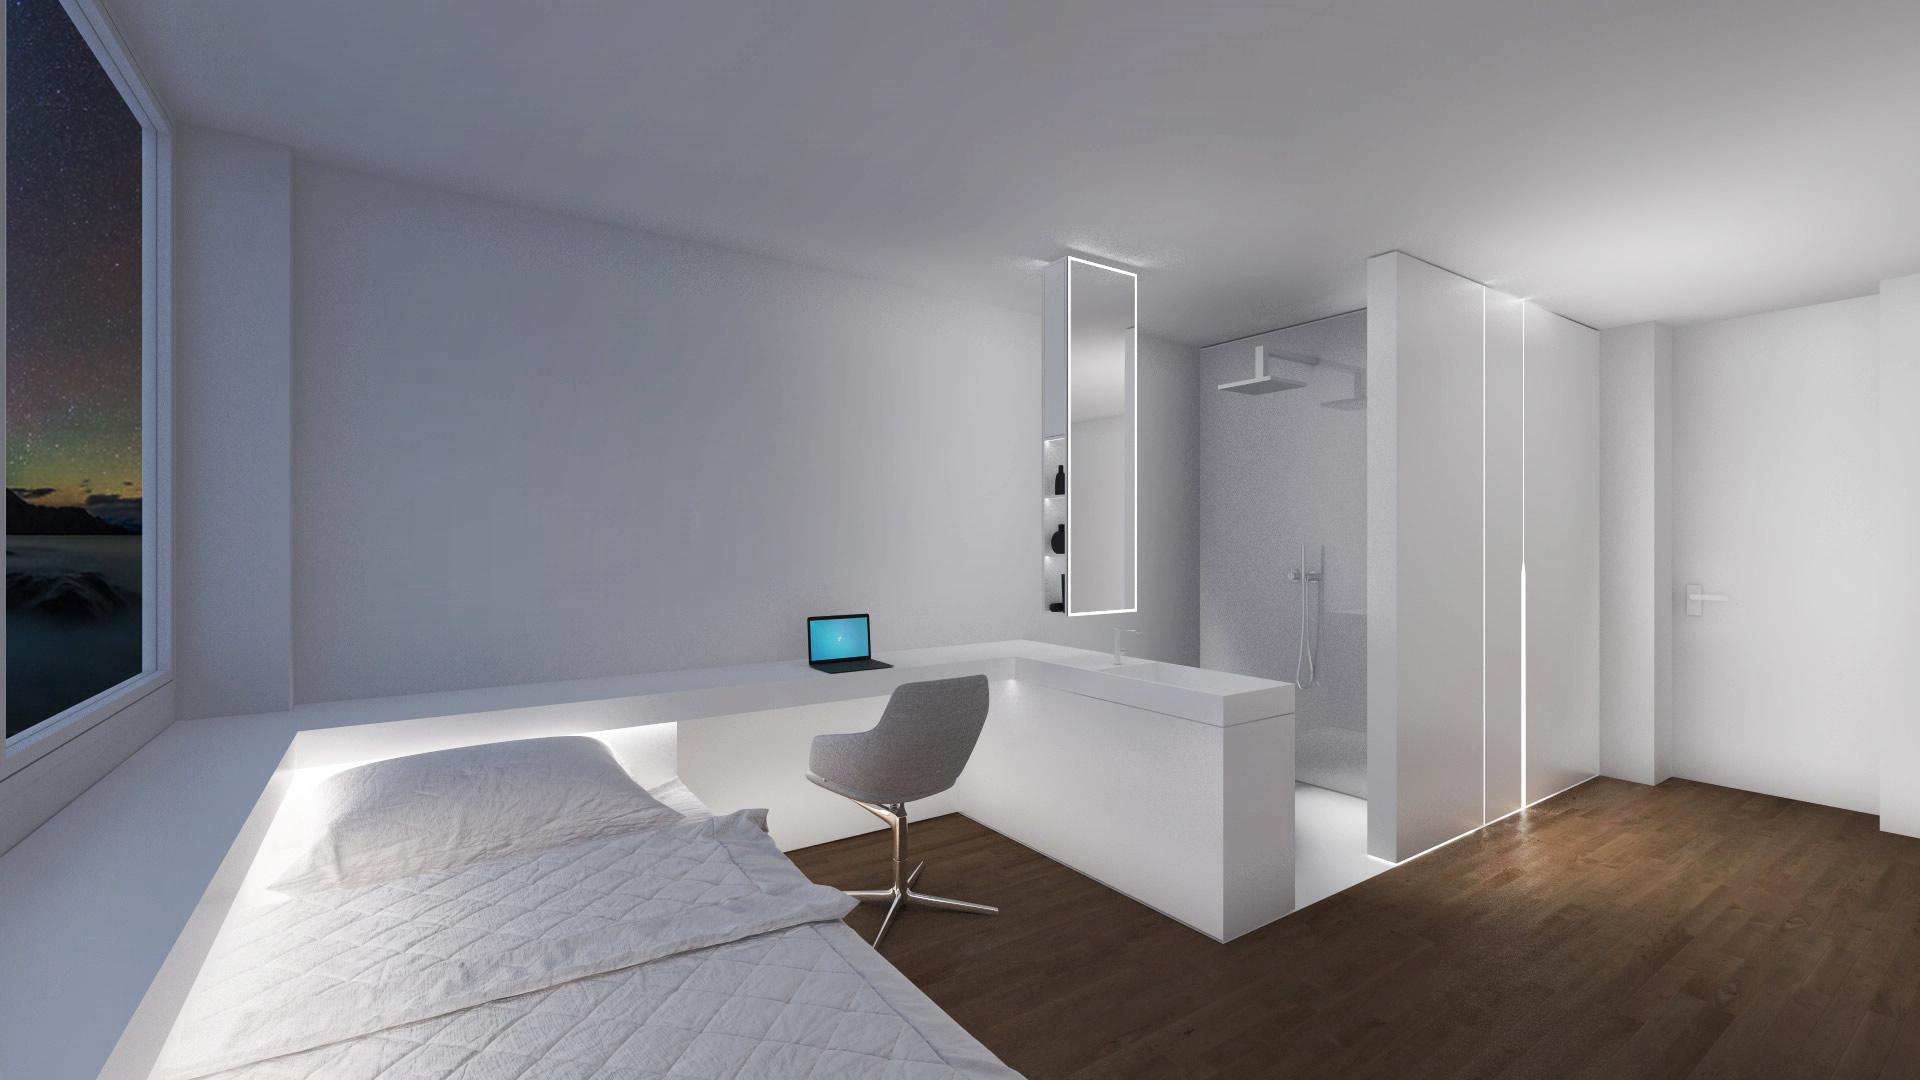 whocares_design_hotel_material-3